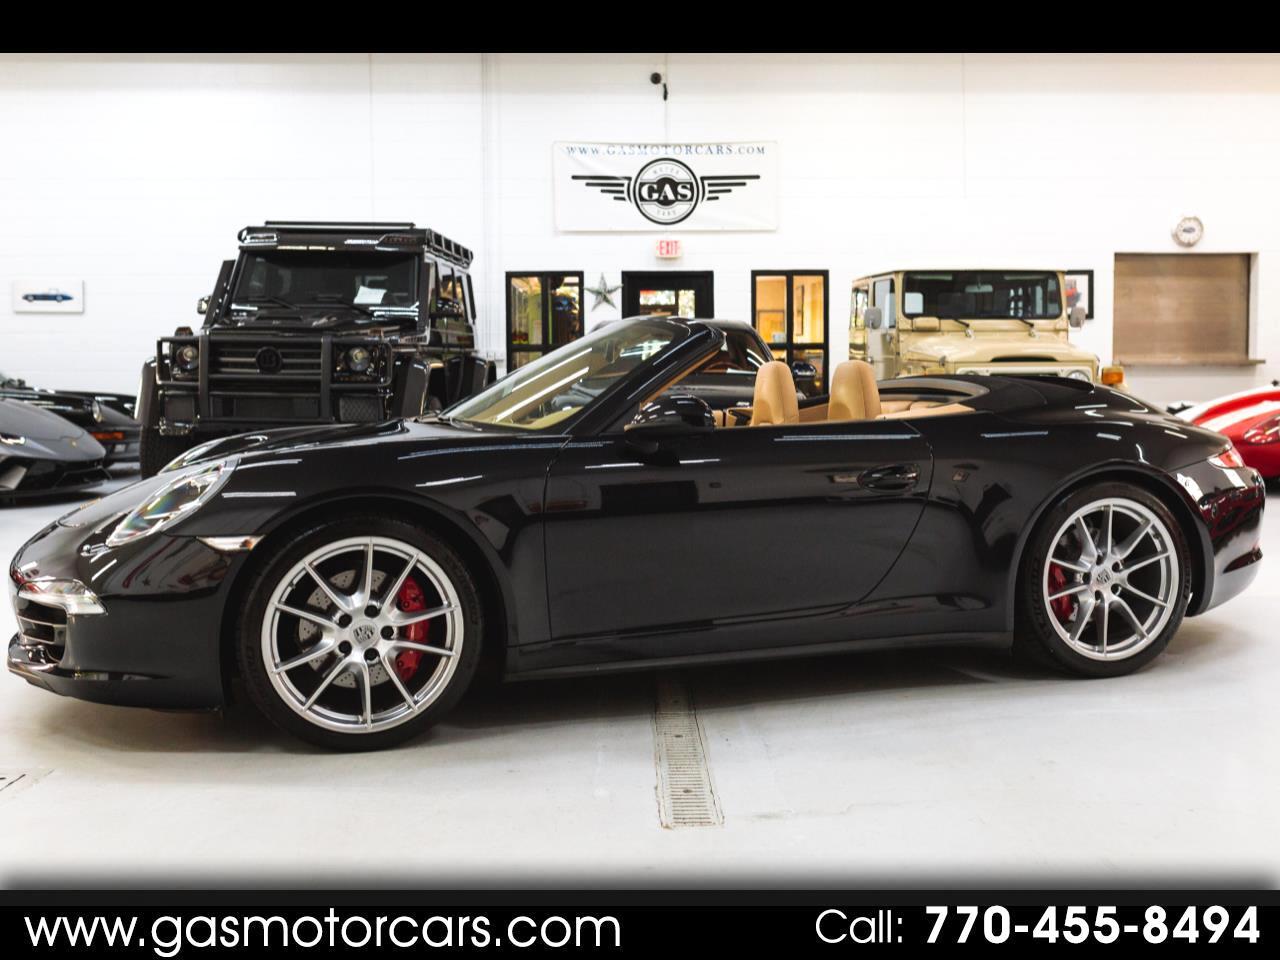 Porsche 911 Carrera 4S Cabriolet 2013